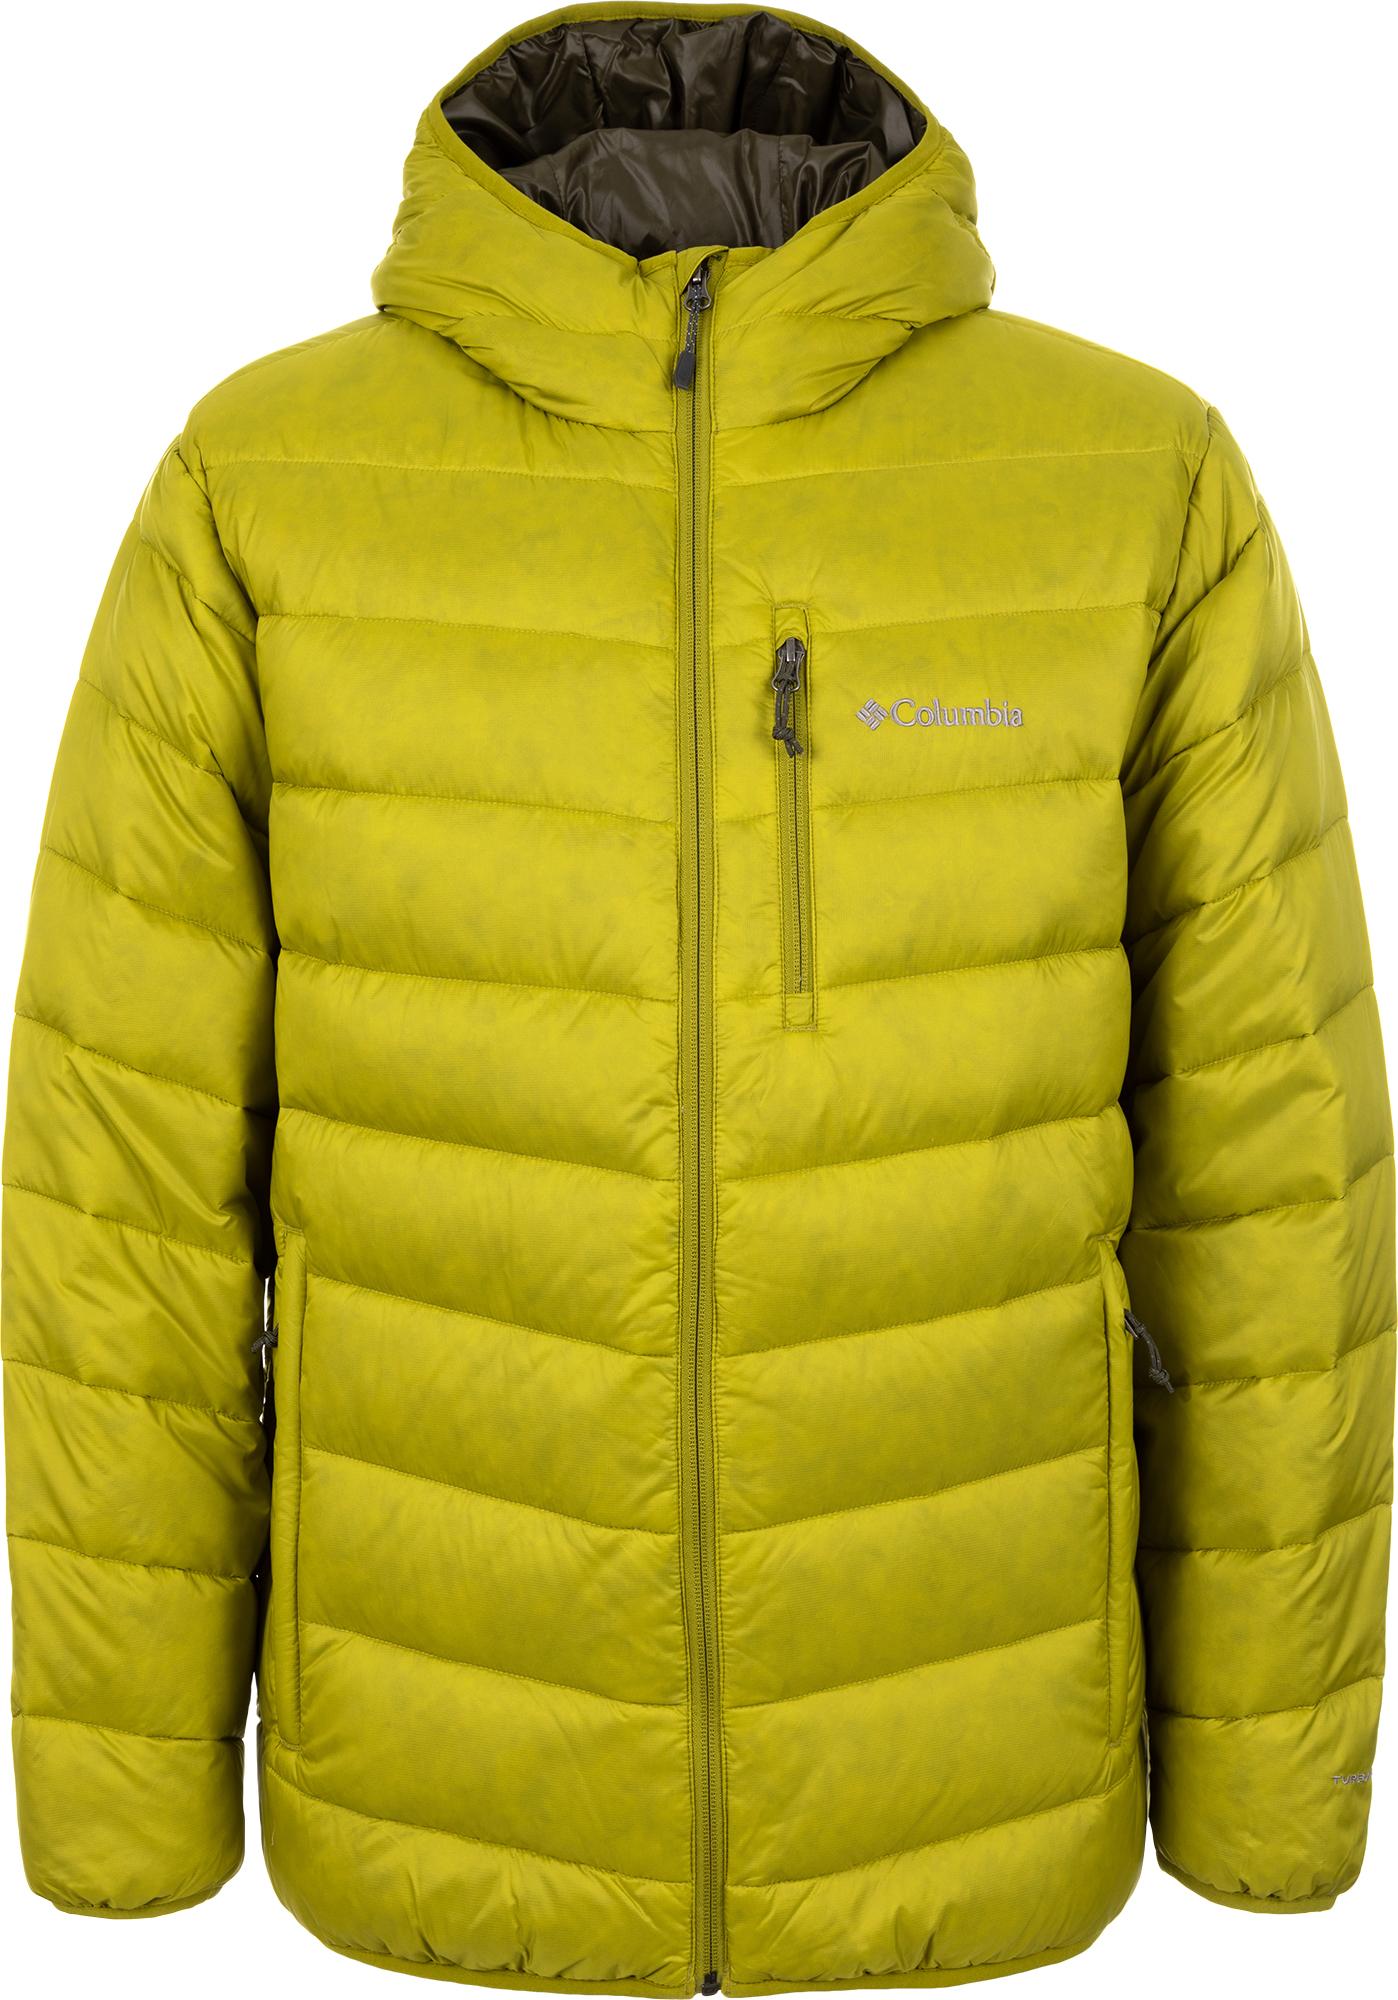 Columbia Куртка пуховая мужская Columbia Hellfire 650 TurboDown, размер 44-46 цена